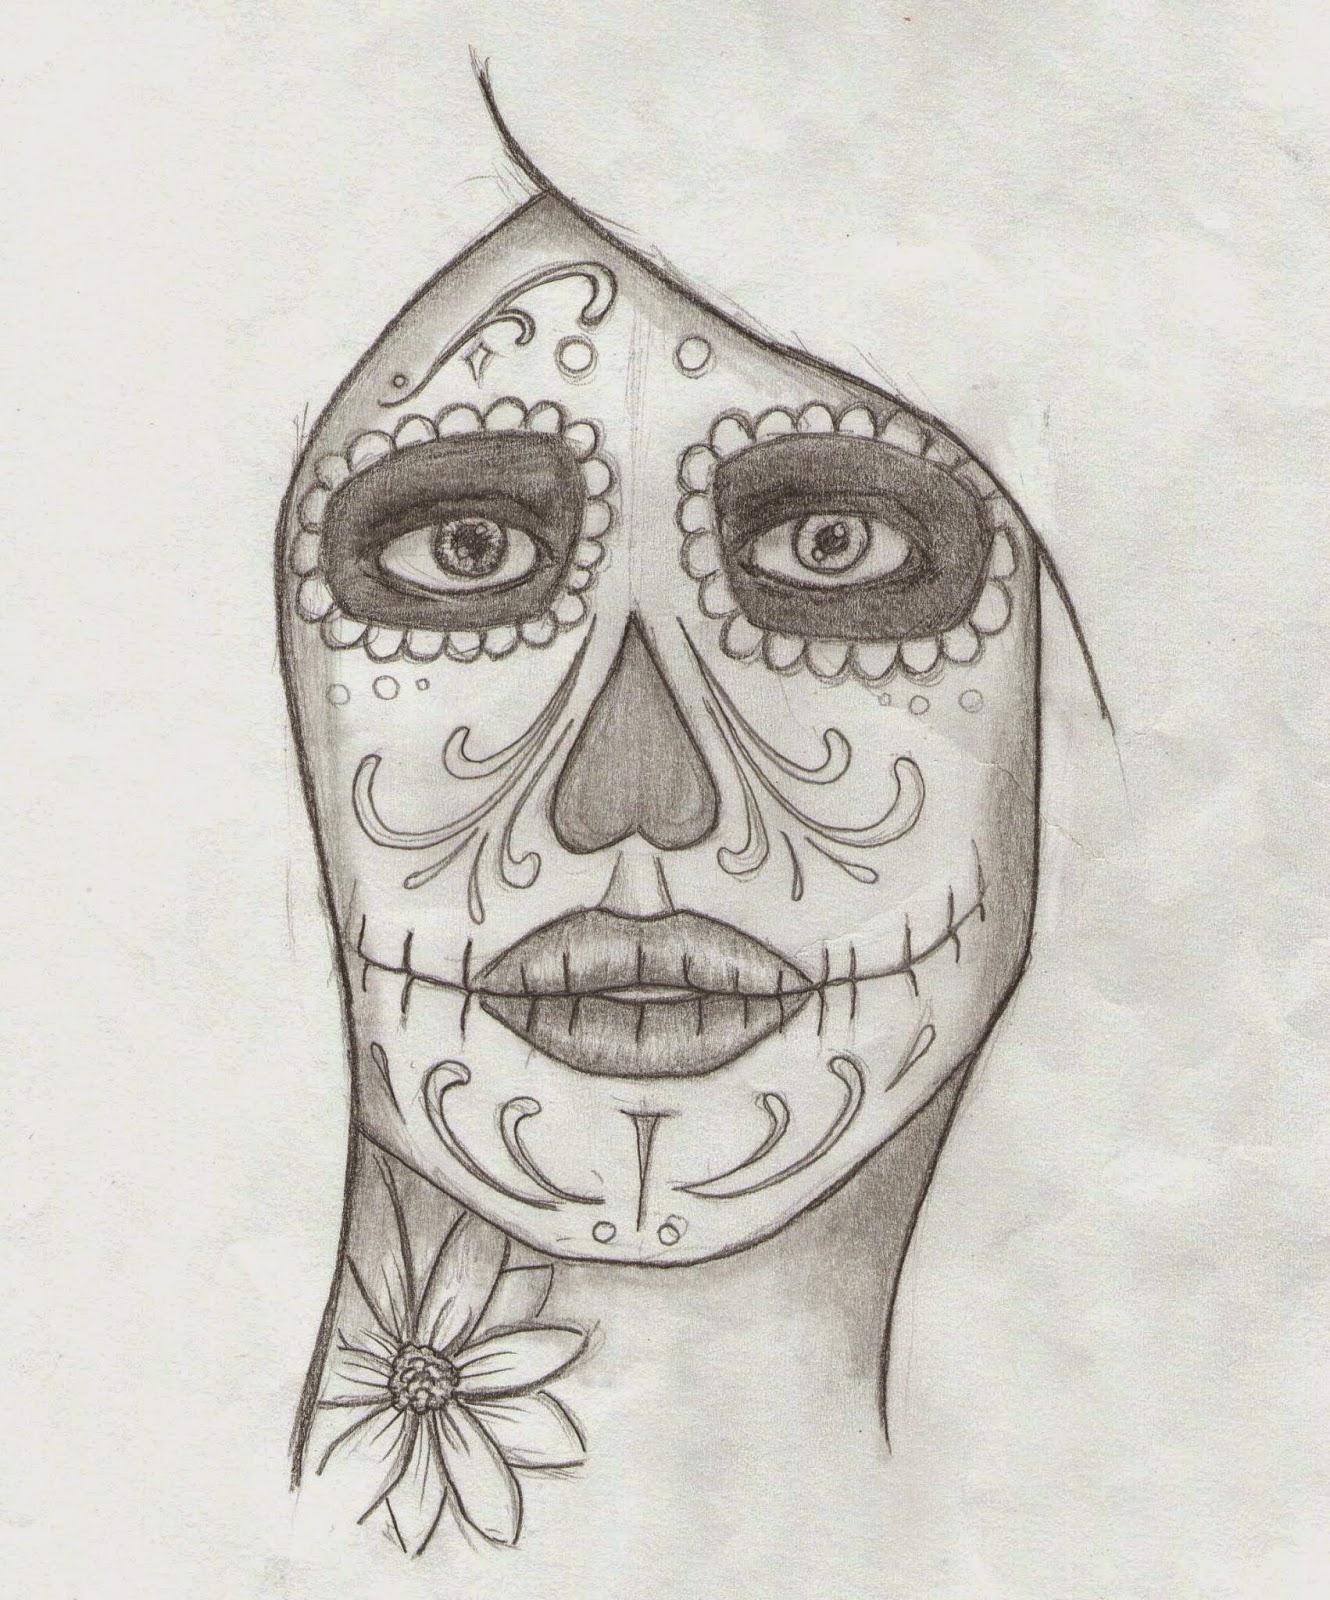 marcos guill233n guill233n dibujo mujer calavera mexicana